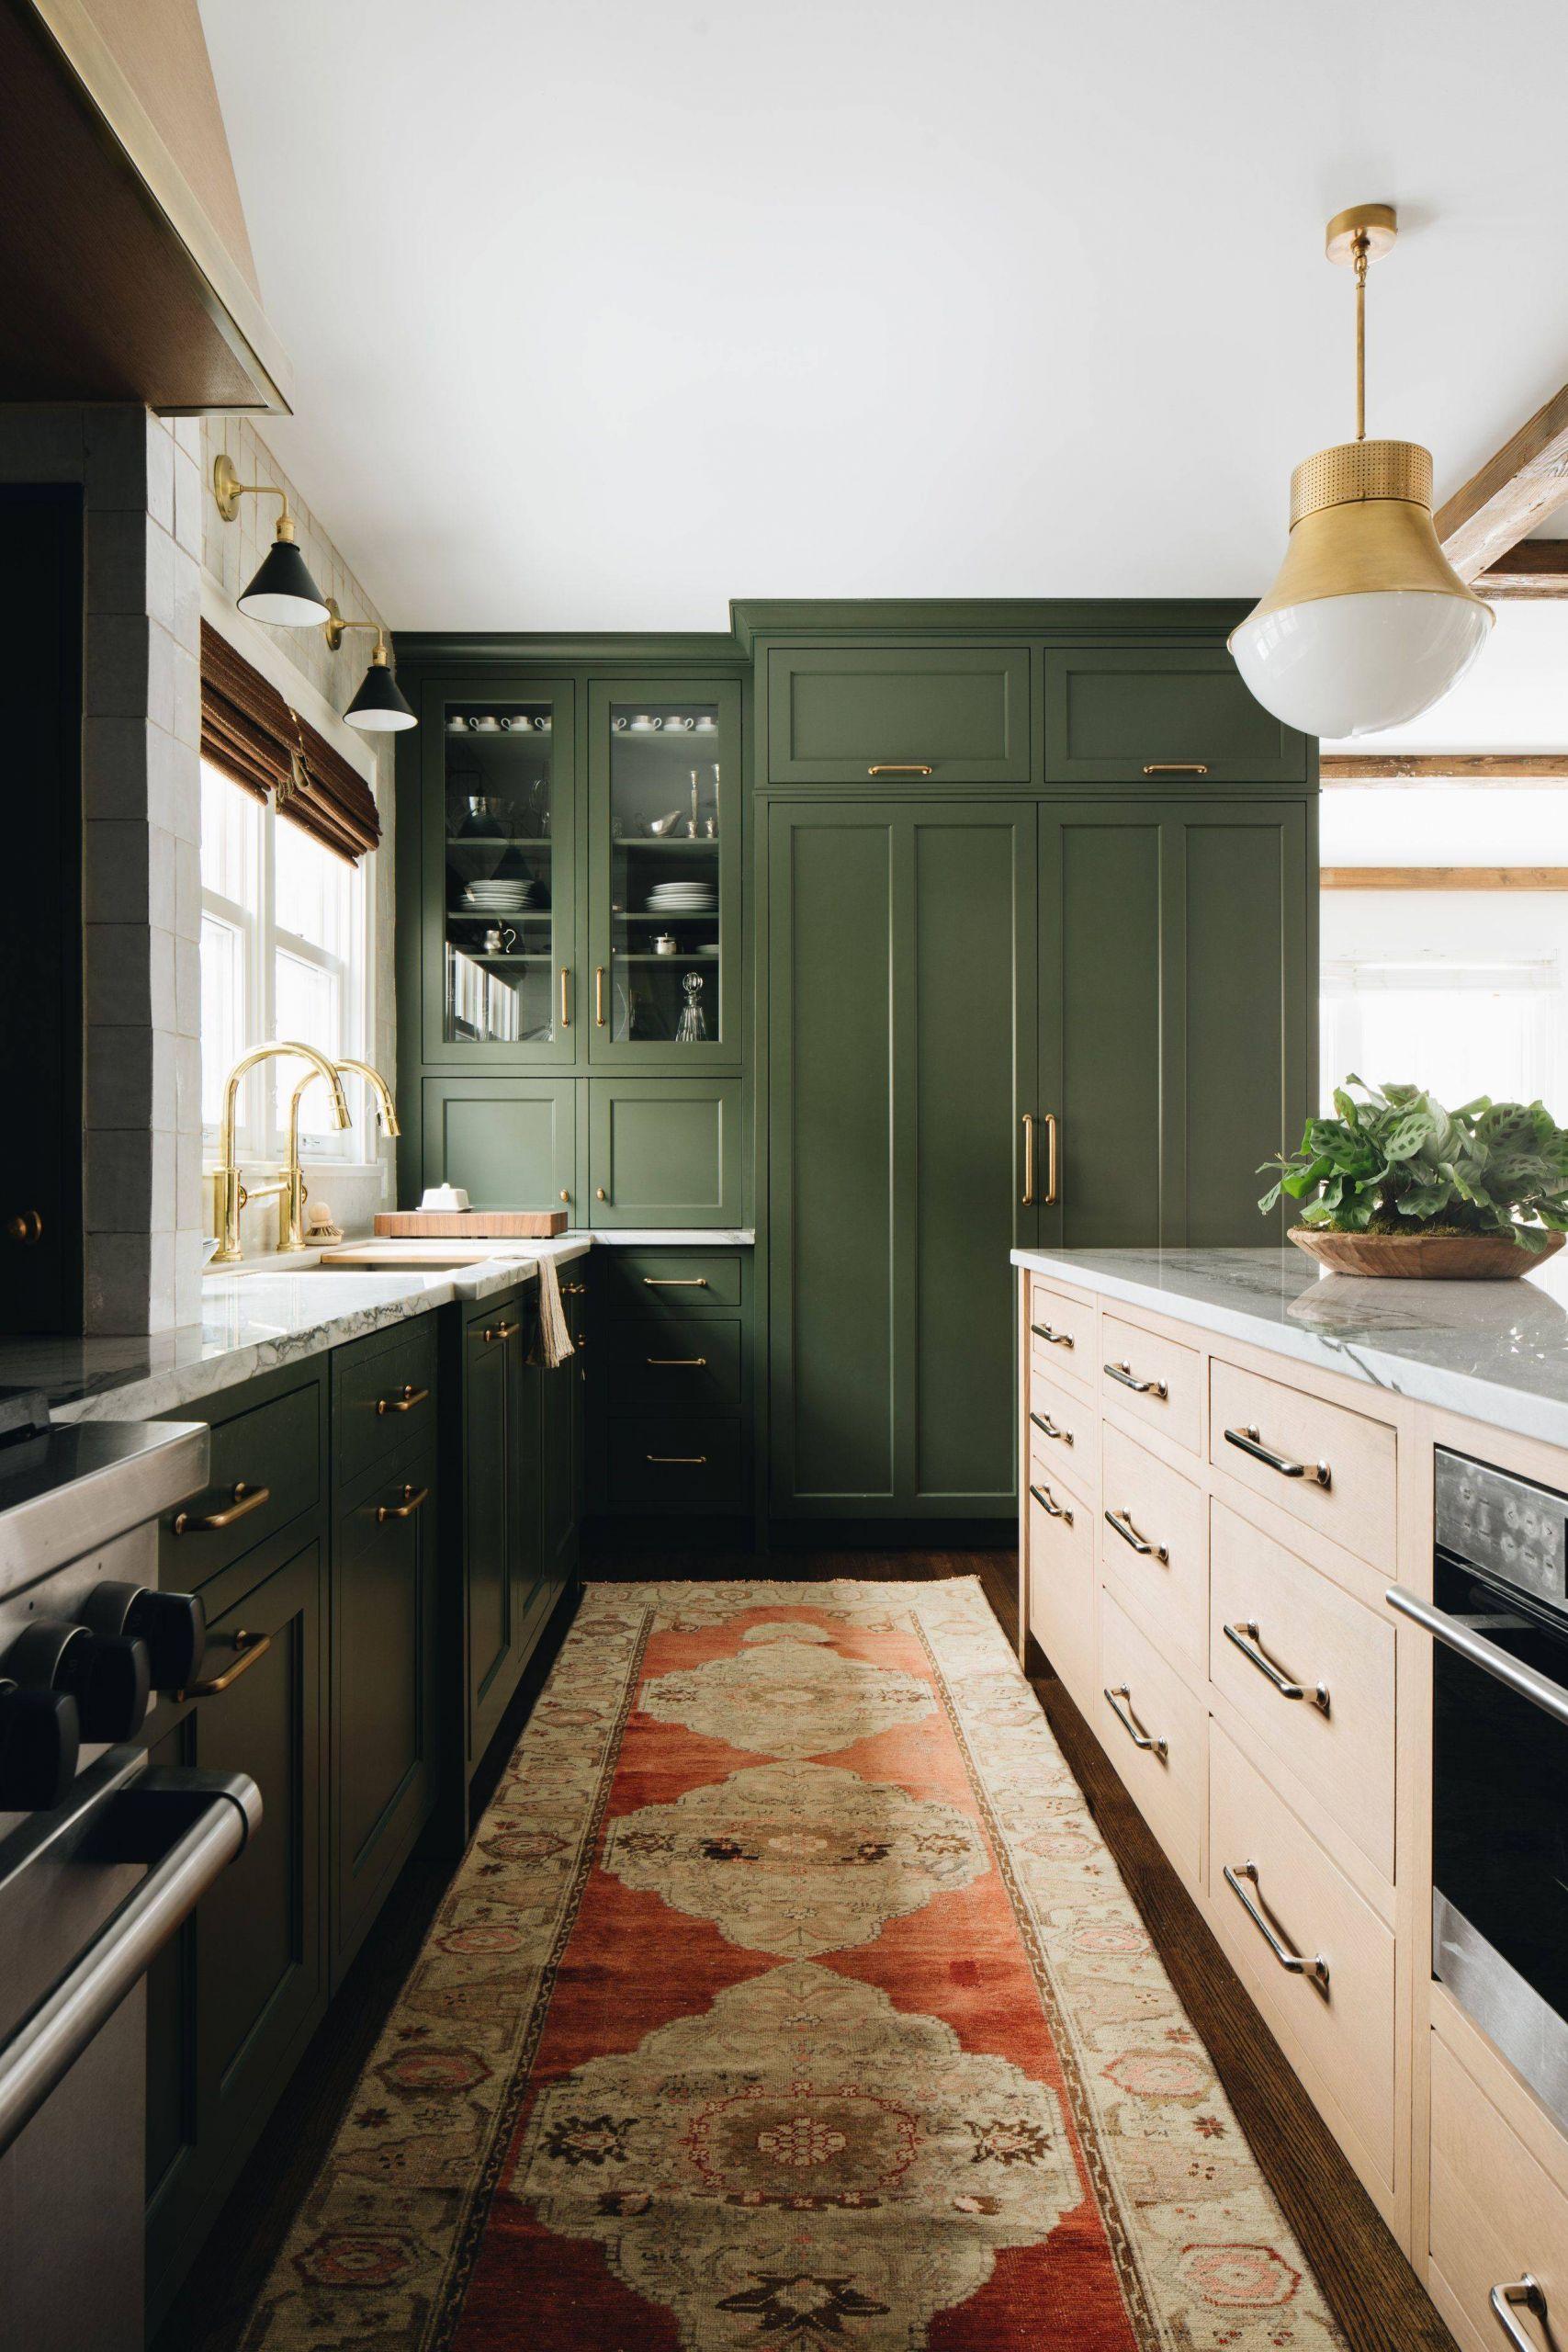 Fresh Design Multi Color Kitchen Decor Buildingdesign Homedesign Architecture Home Design Housedesig In 2020 Green Kitchen Cabinets Kitchen Plans Green Cabinets